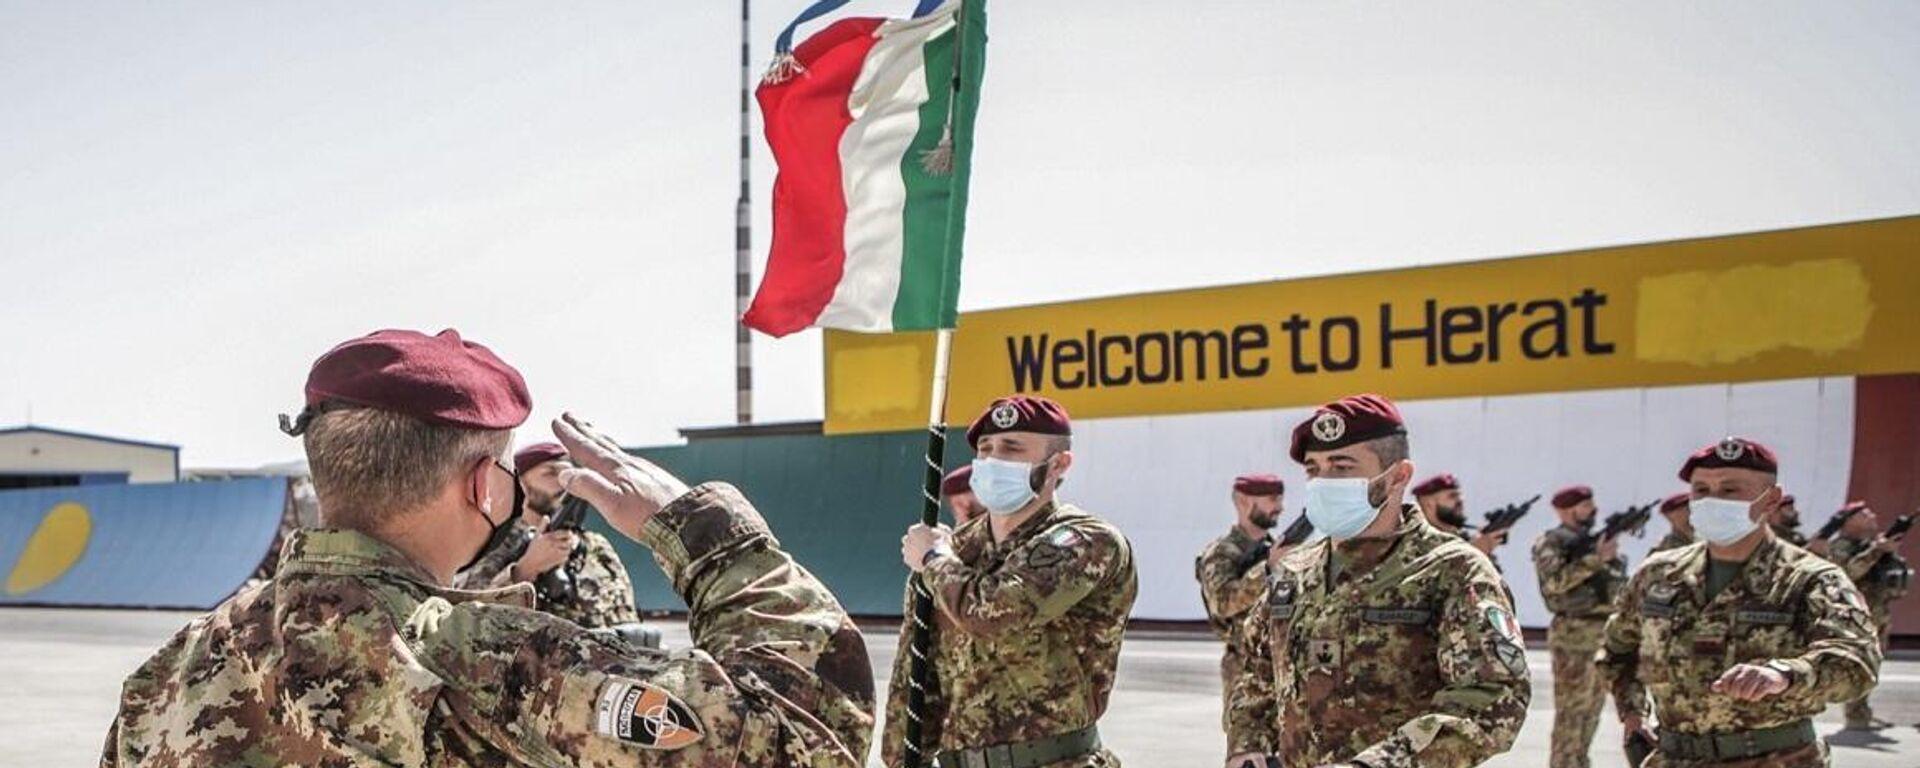 Difesa: Missione italiana in Afghanistan conclusa ufficialmente - Sputnik Italia, 1920, 30.06.2021